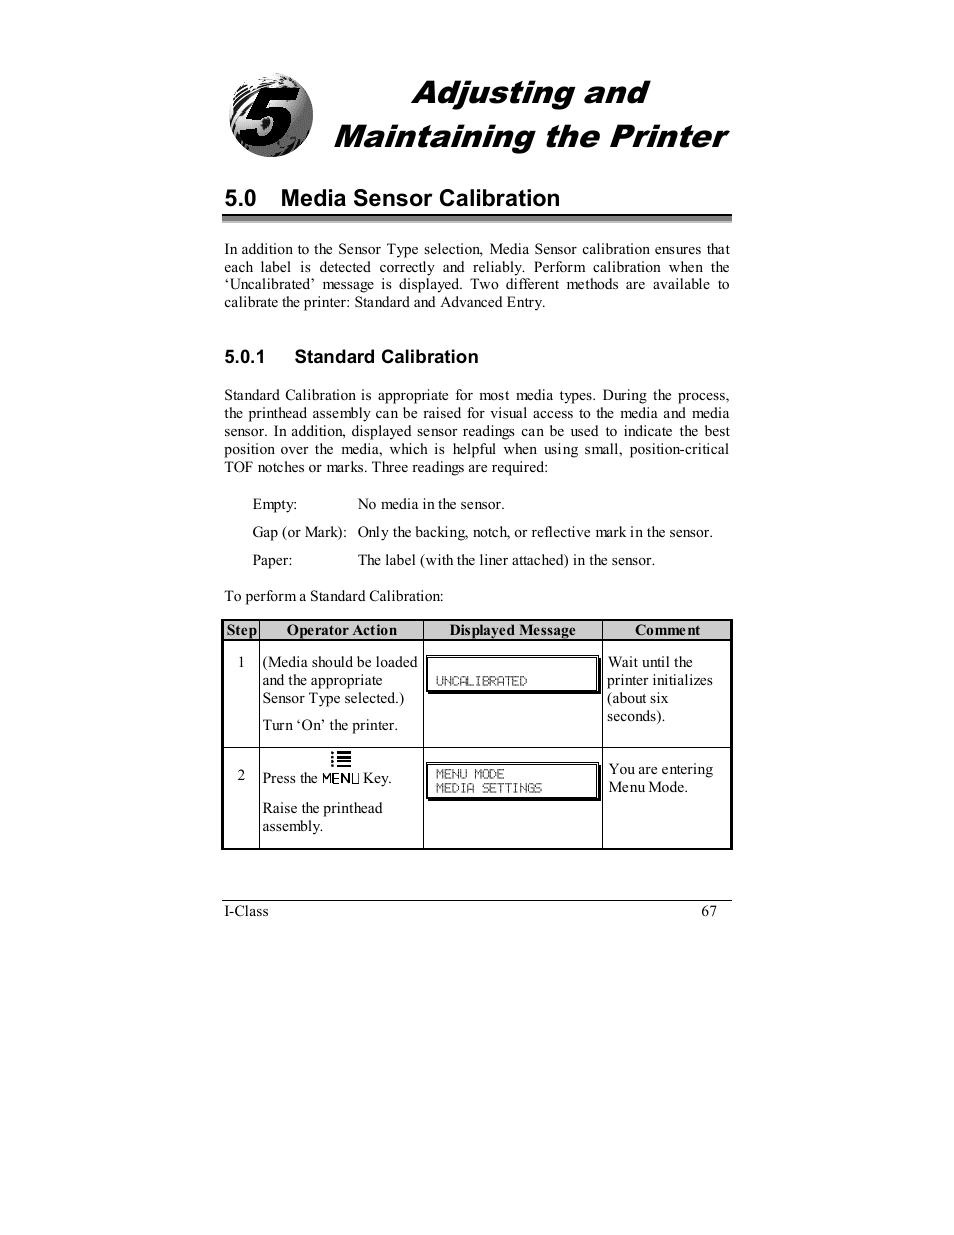 Adjusting and maintaining the printer, 0 media sensor calibration   Datamax  I-4208 User